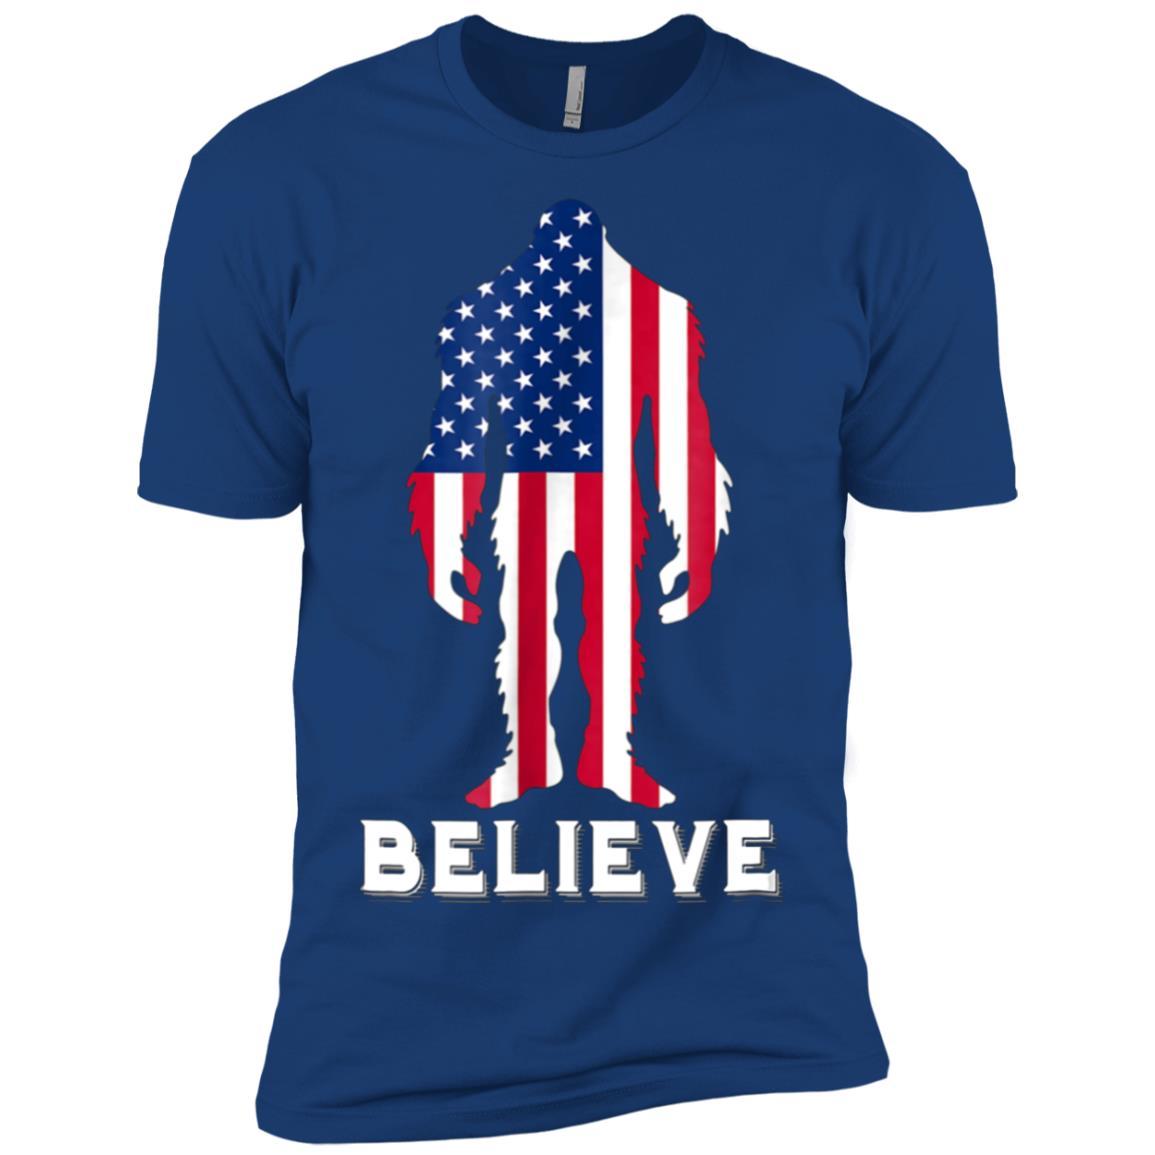 4th Of July Clothes Bigfoot Believe Patriotic Men Short Sleeve T-Shirt